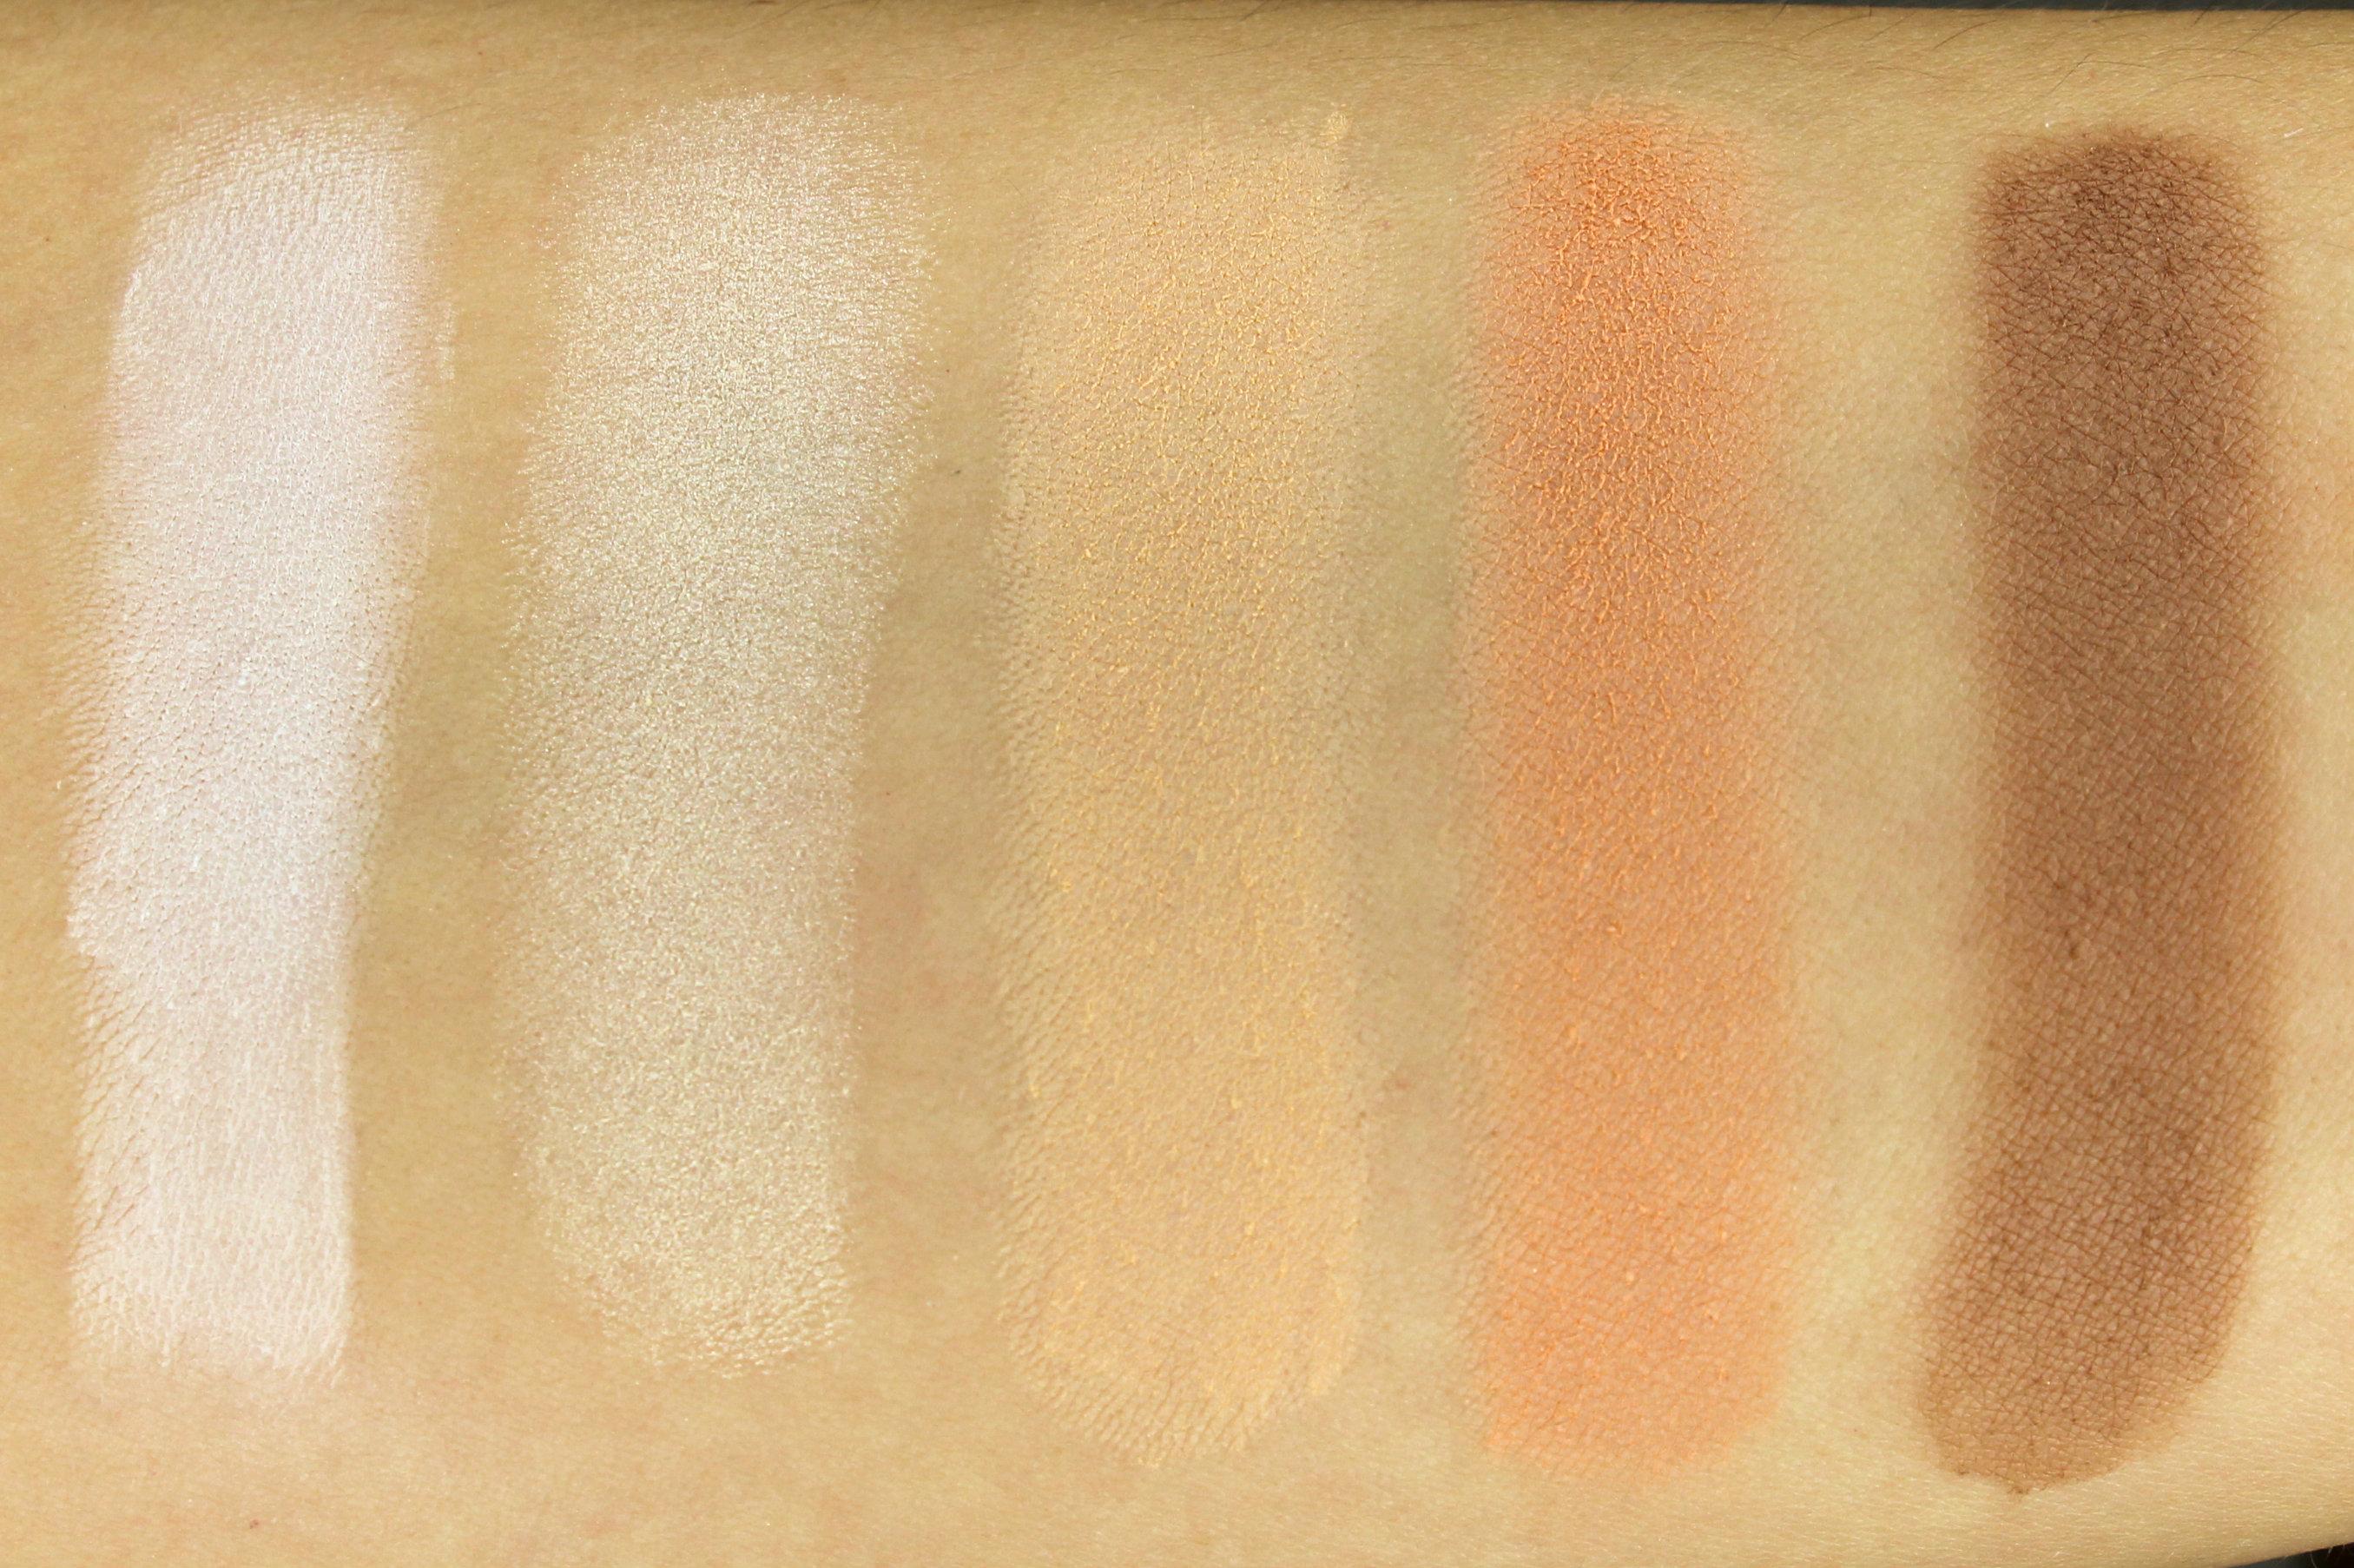 Neve Cosmetics Elegantissimi Eyeshadow Palette Swatches